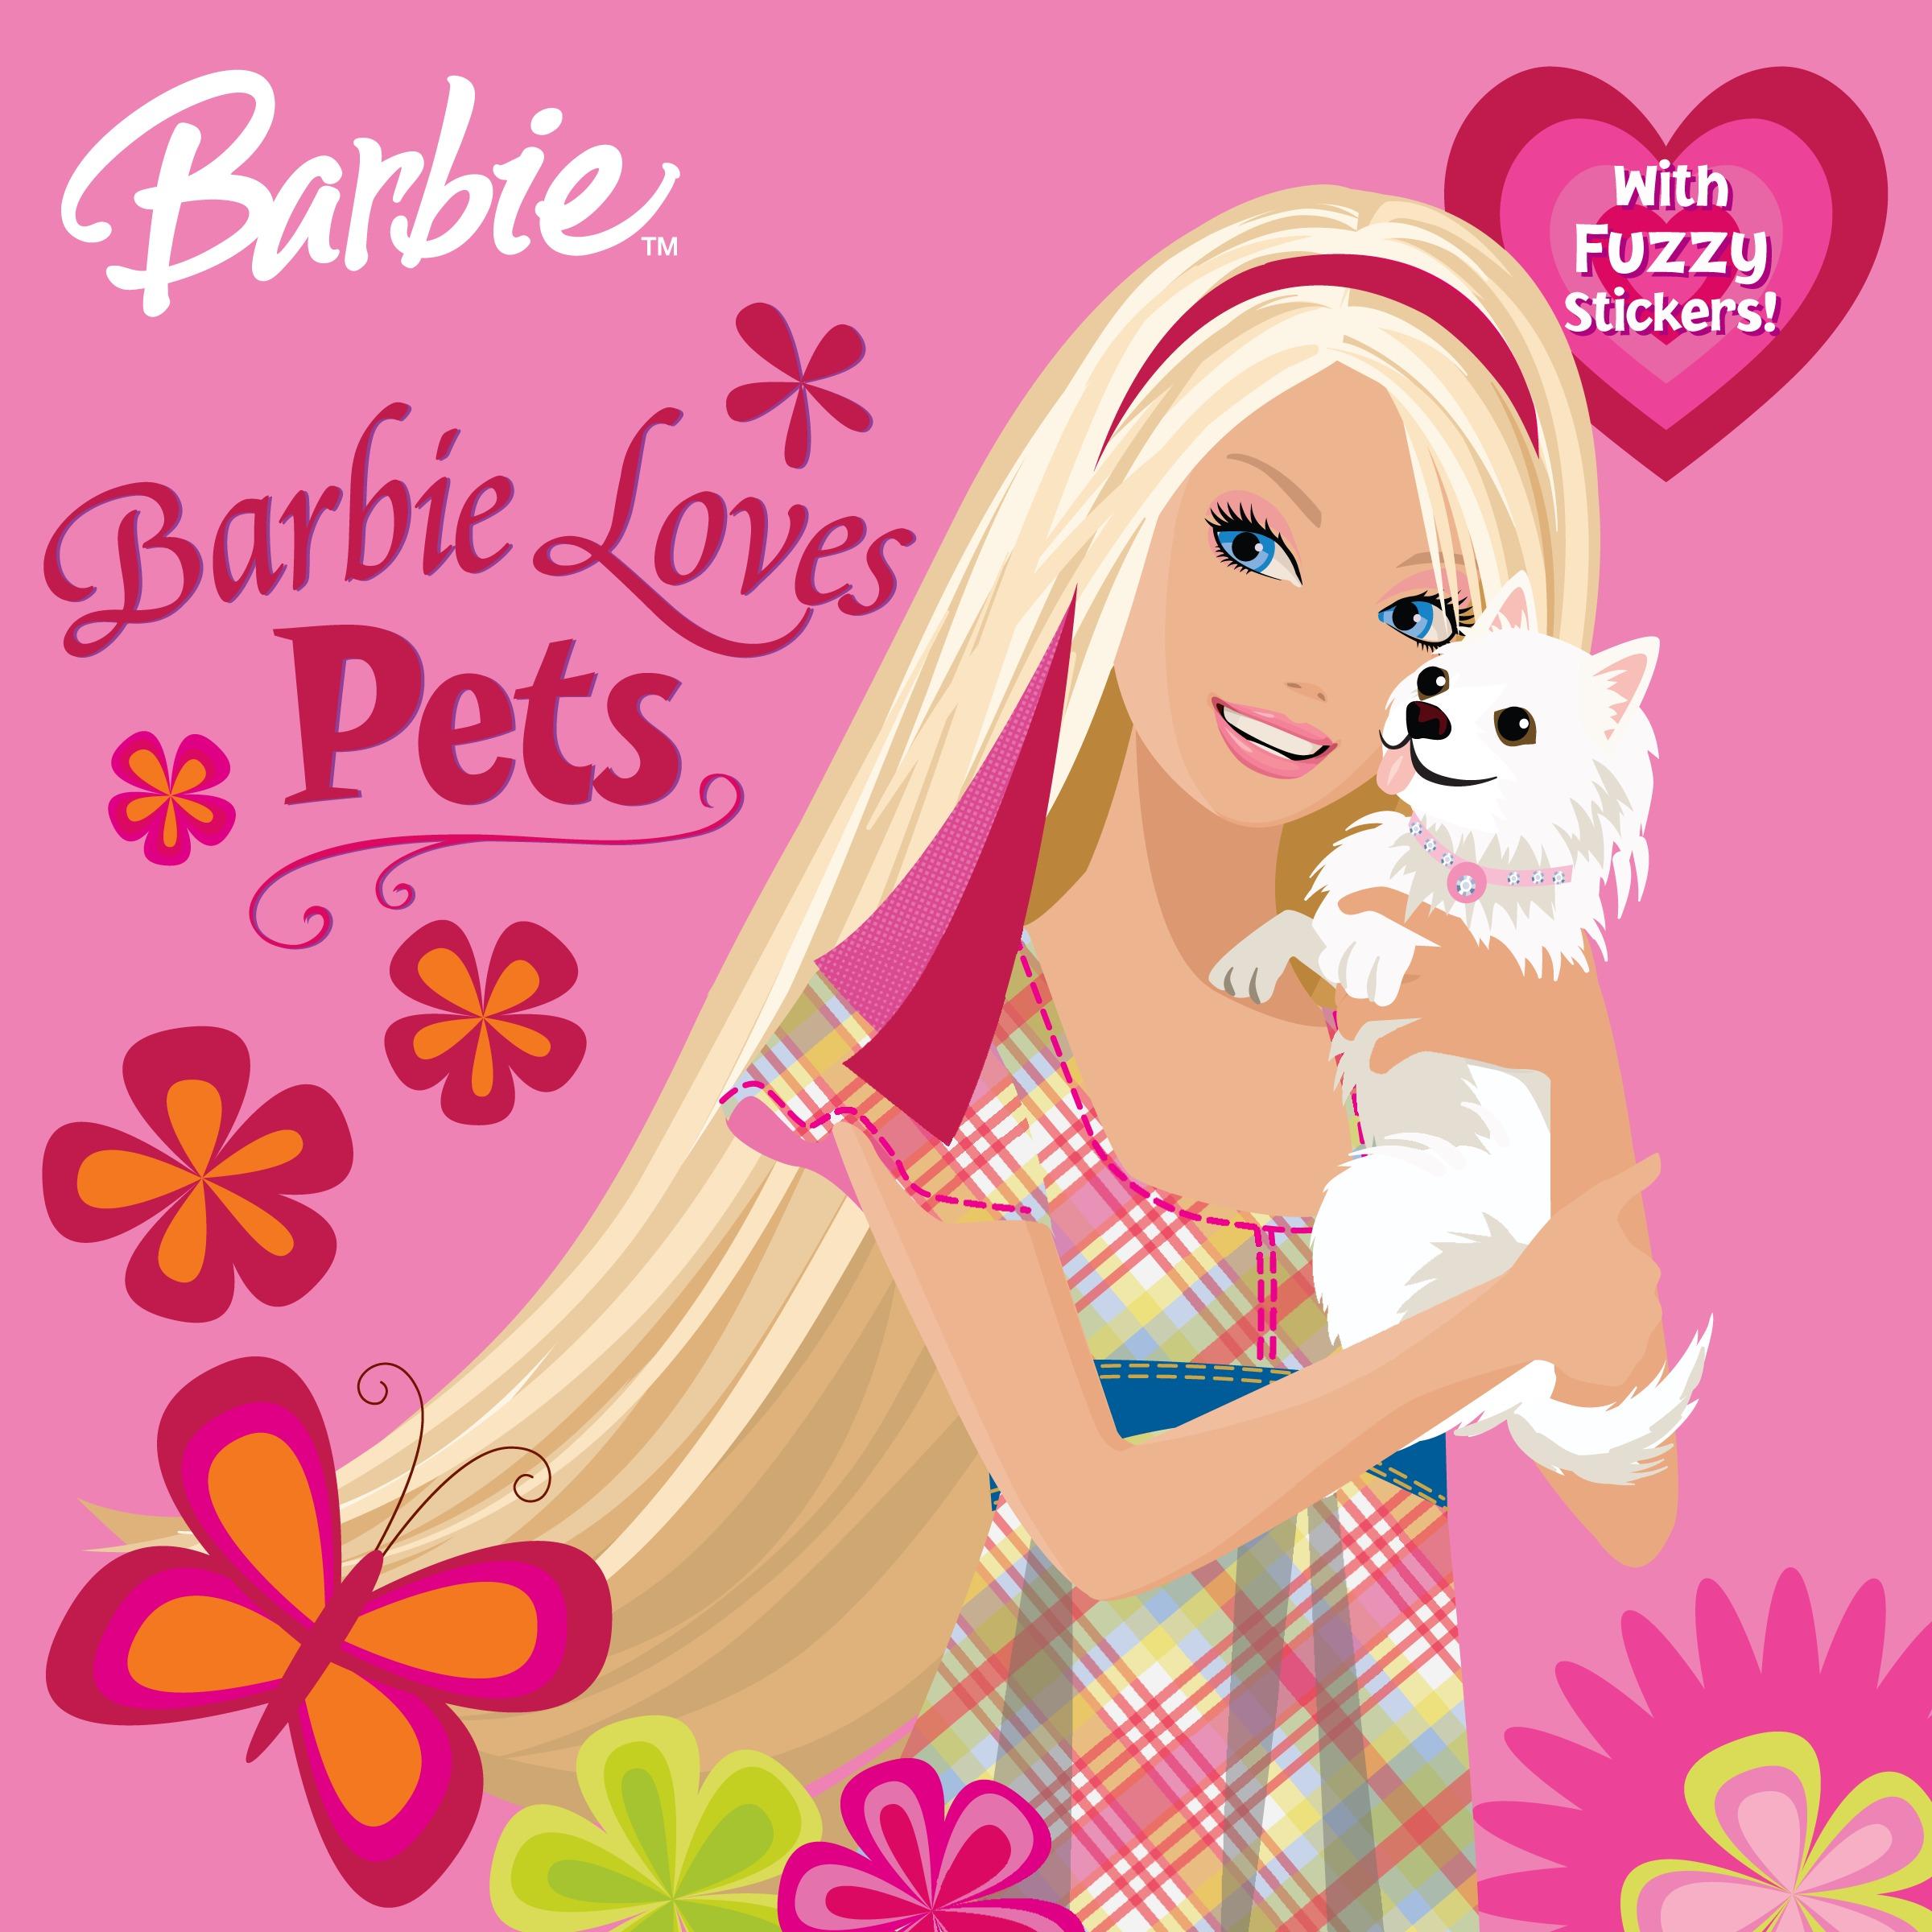 Barbie Loves Pets (Barbie)